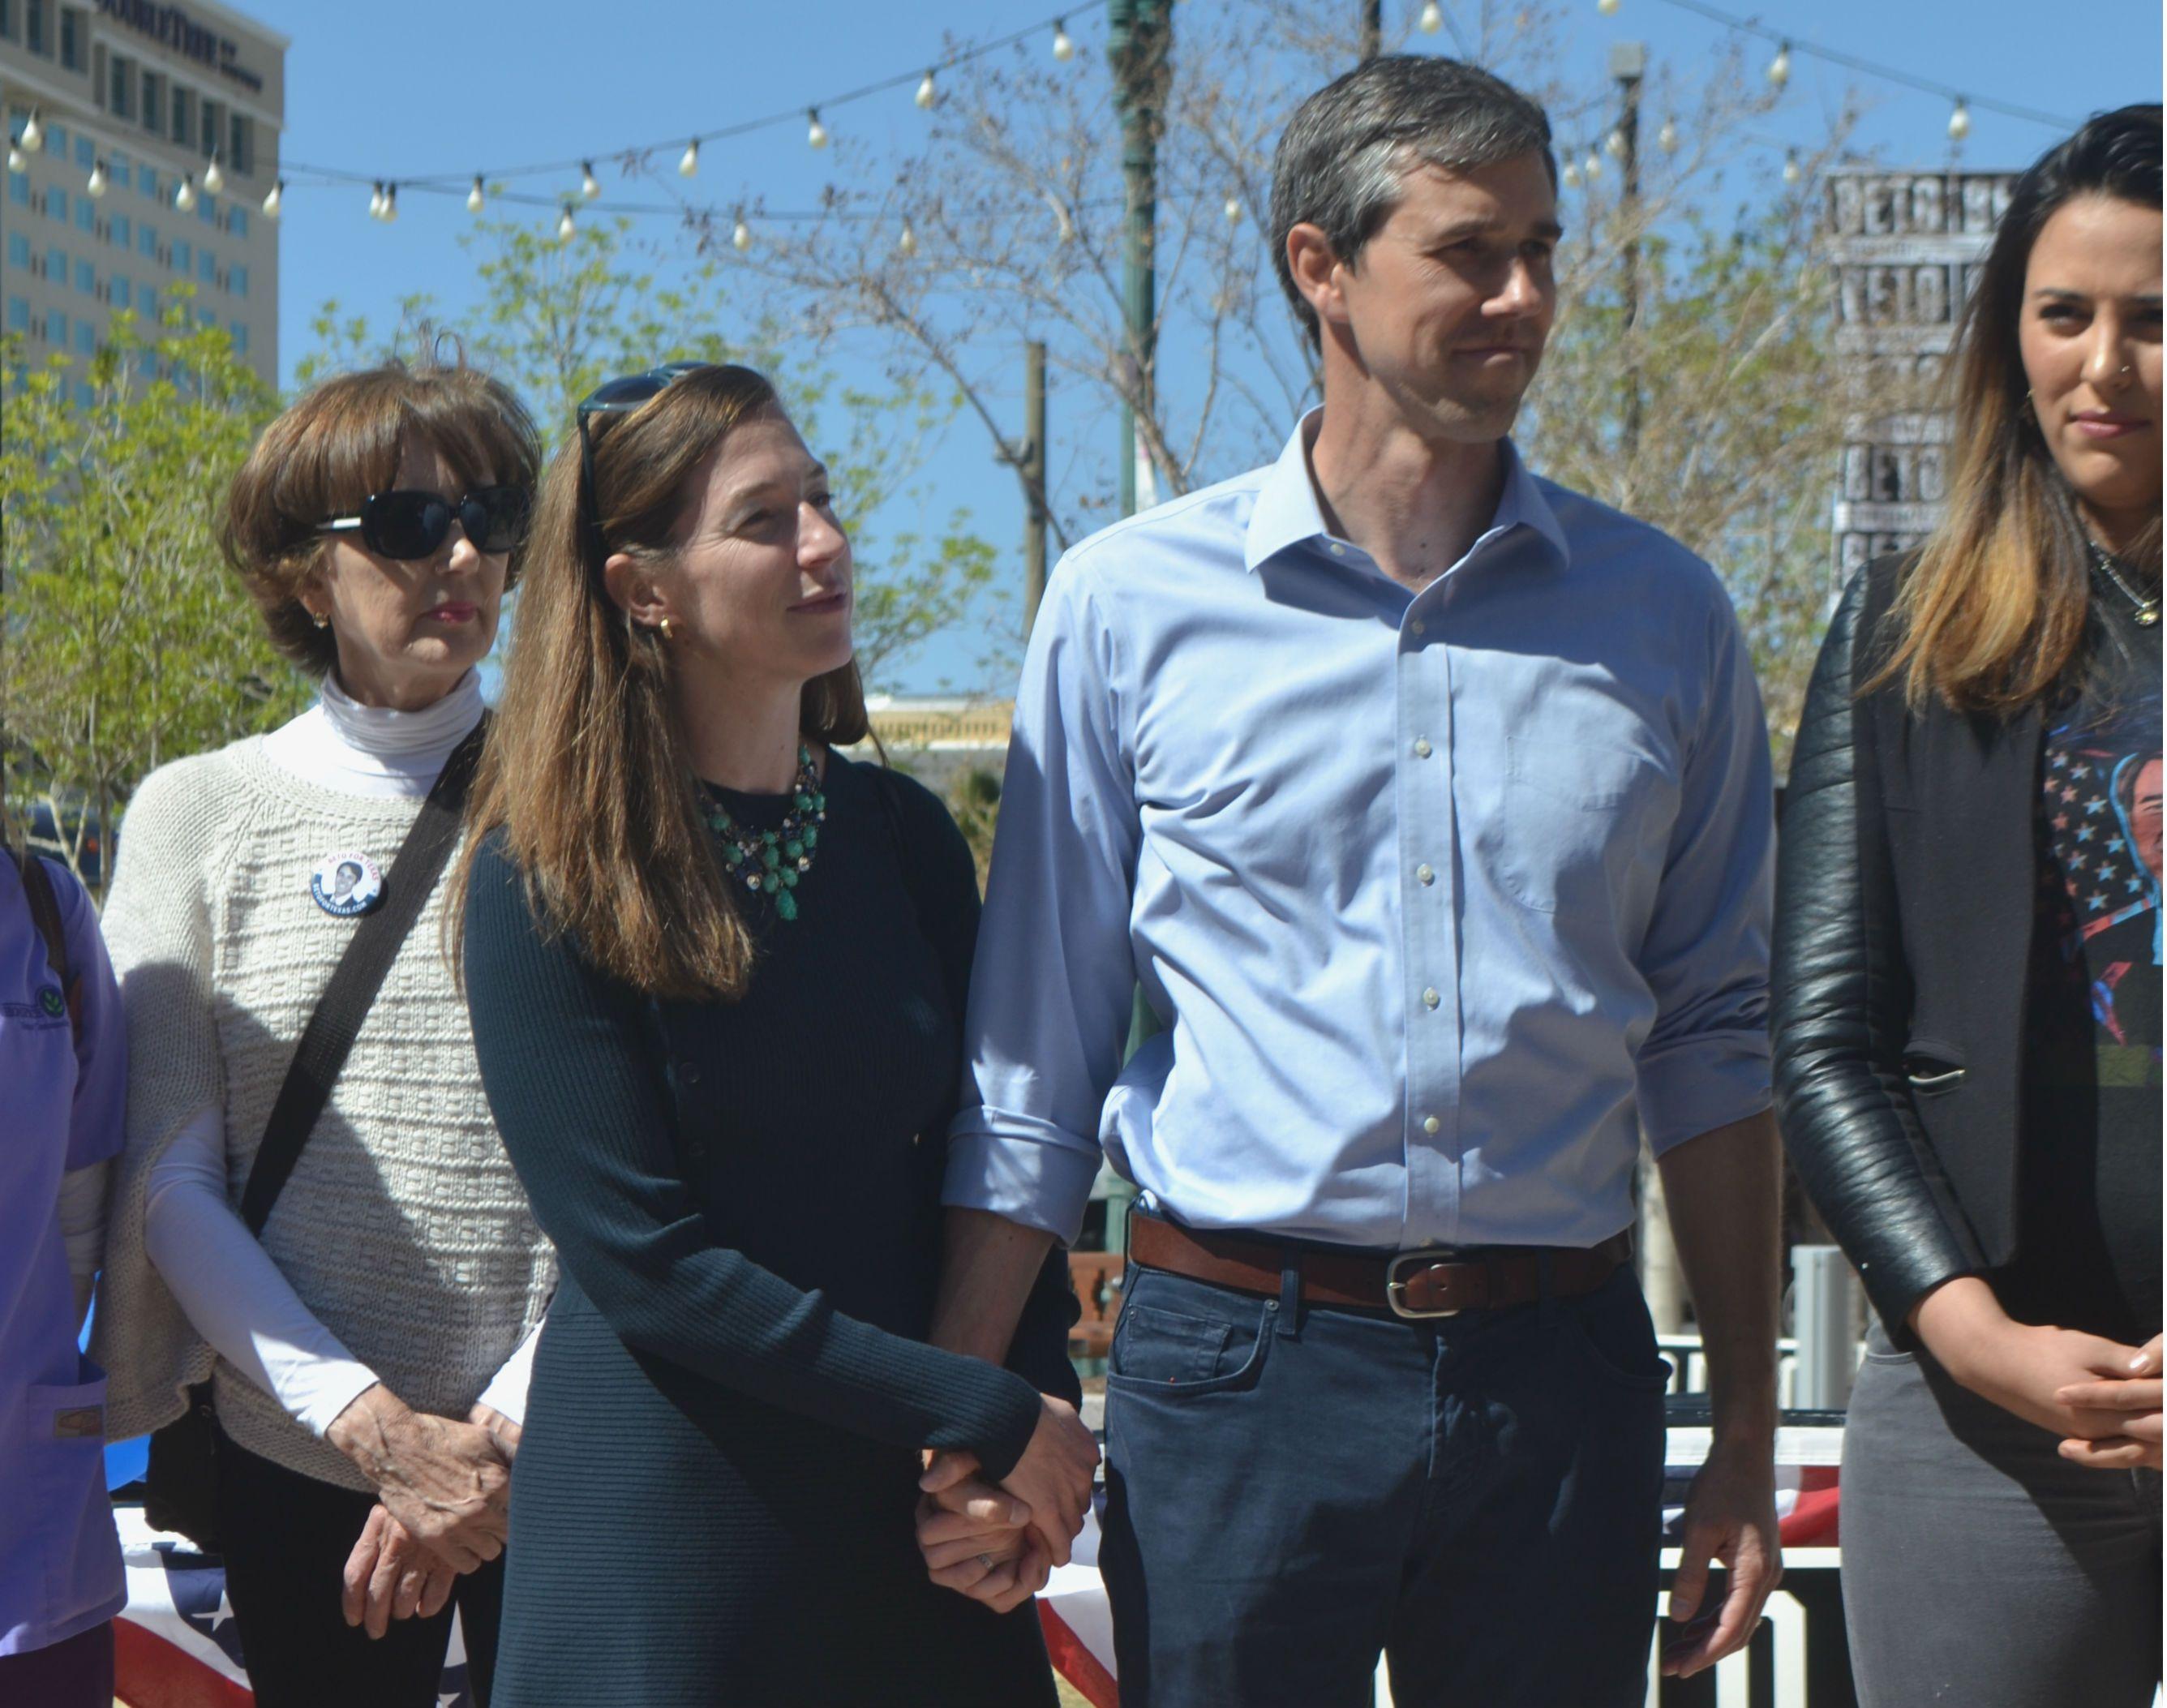 Beto O'Rourke is sharing some love to El Paso and his Wife during his San Jacinto Plaza campaign. #ElPaso #Vote #BetoORourke #SanJacintoPlaza #BetoForTexas #Texas #Politics